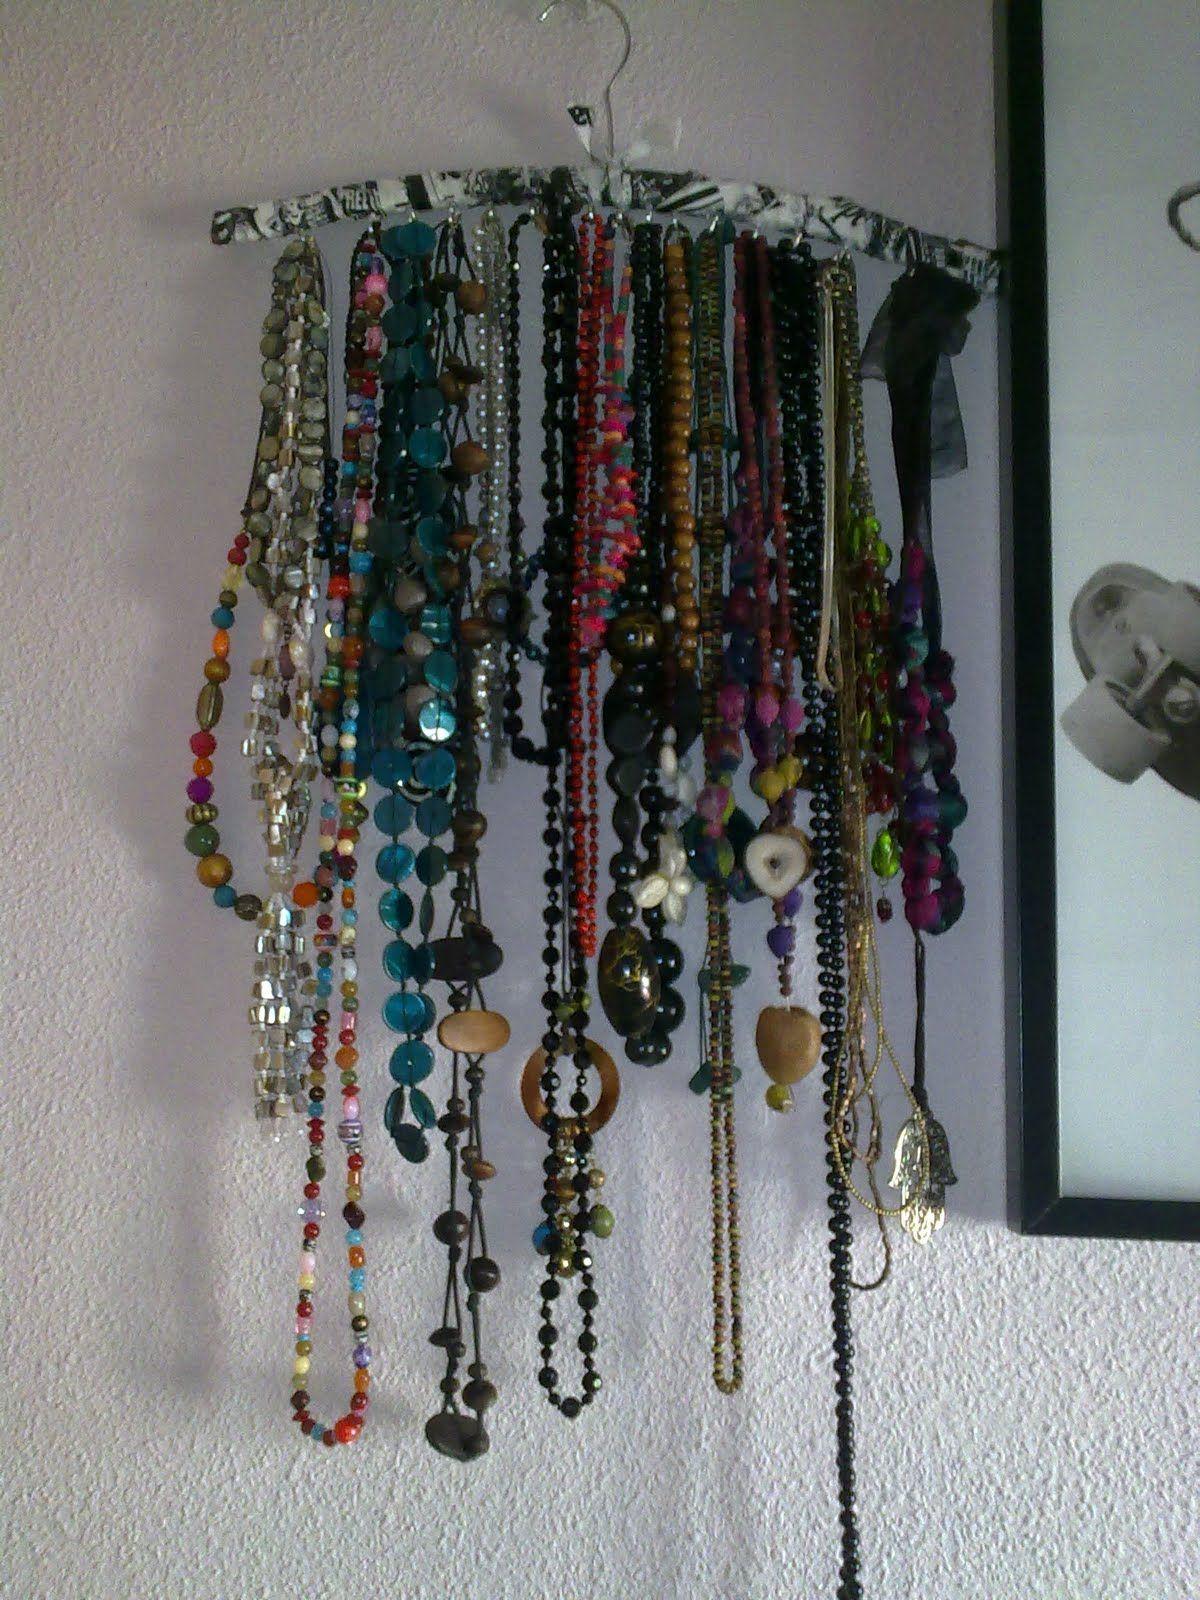 Perchero para collares decoraci n pinterest santa - Para colgar collares ...